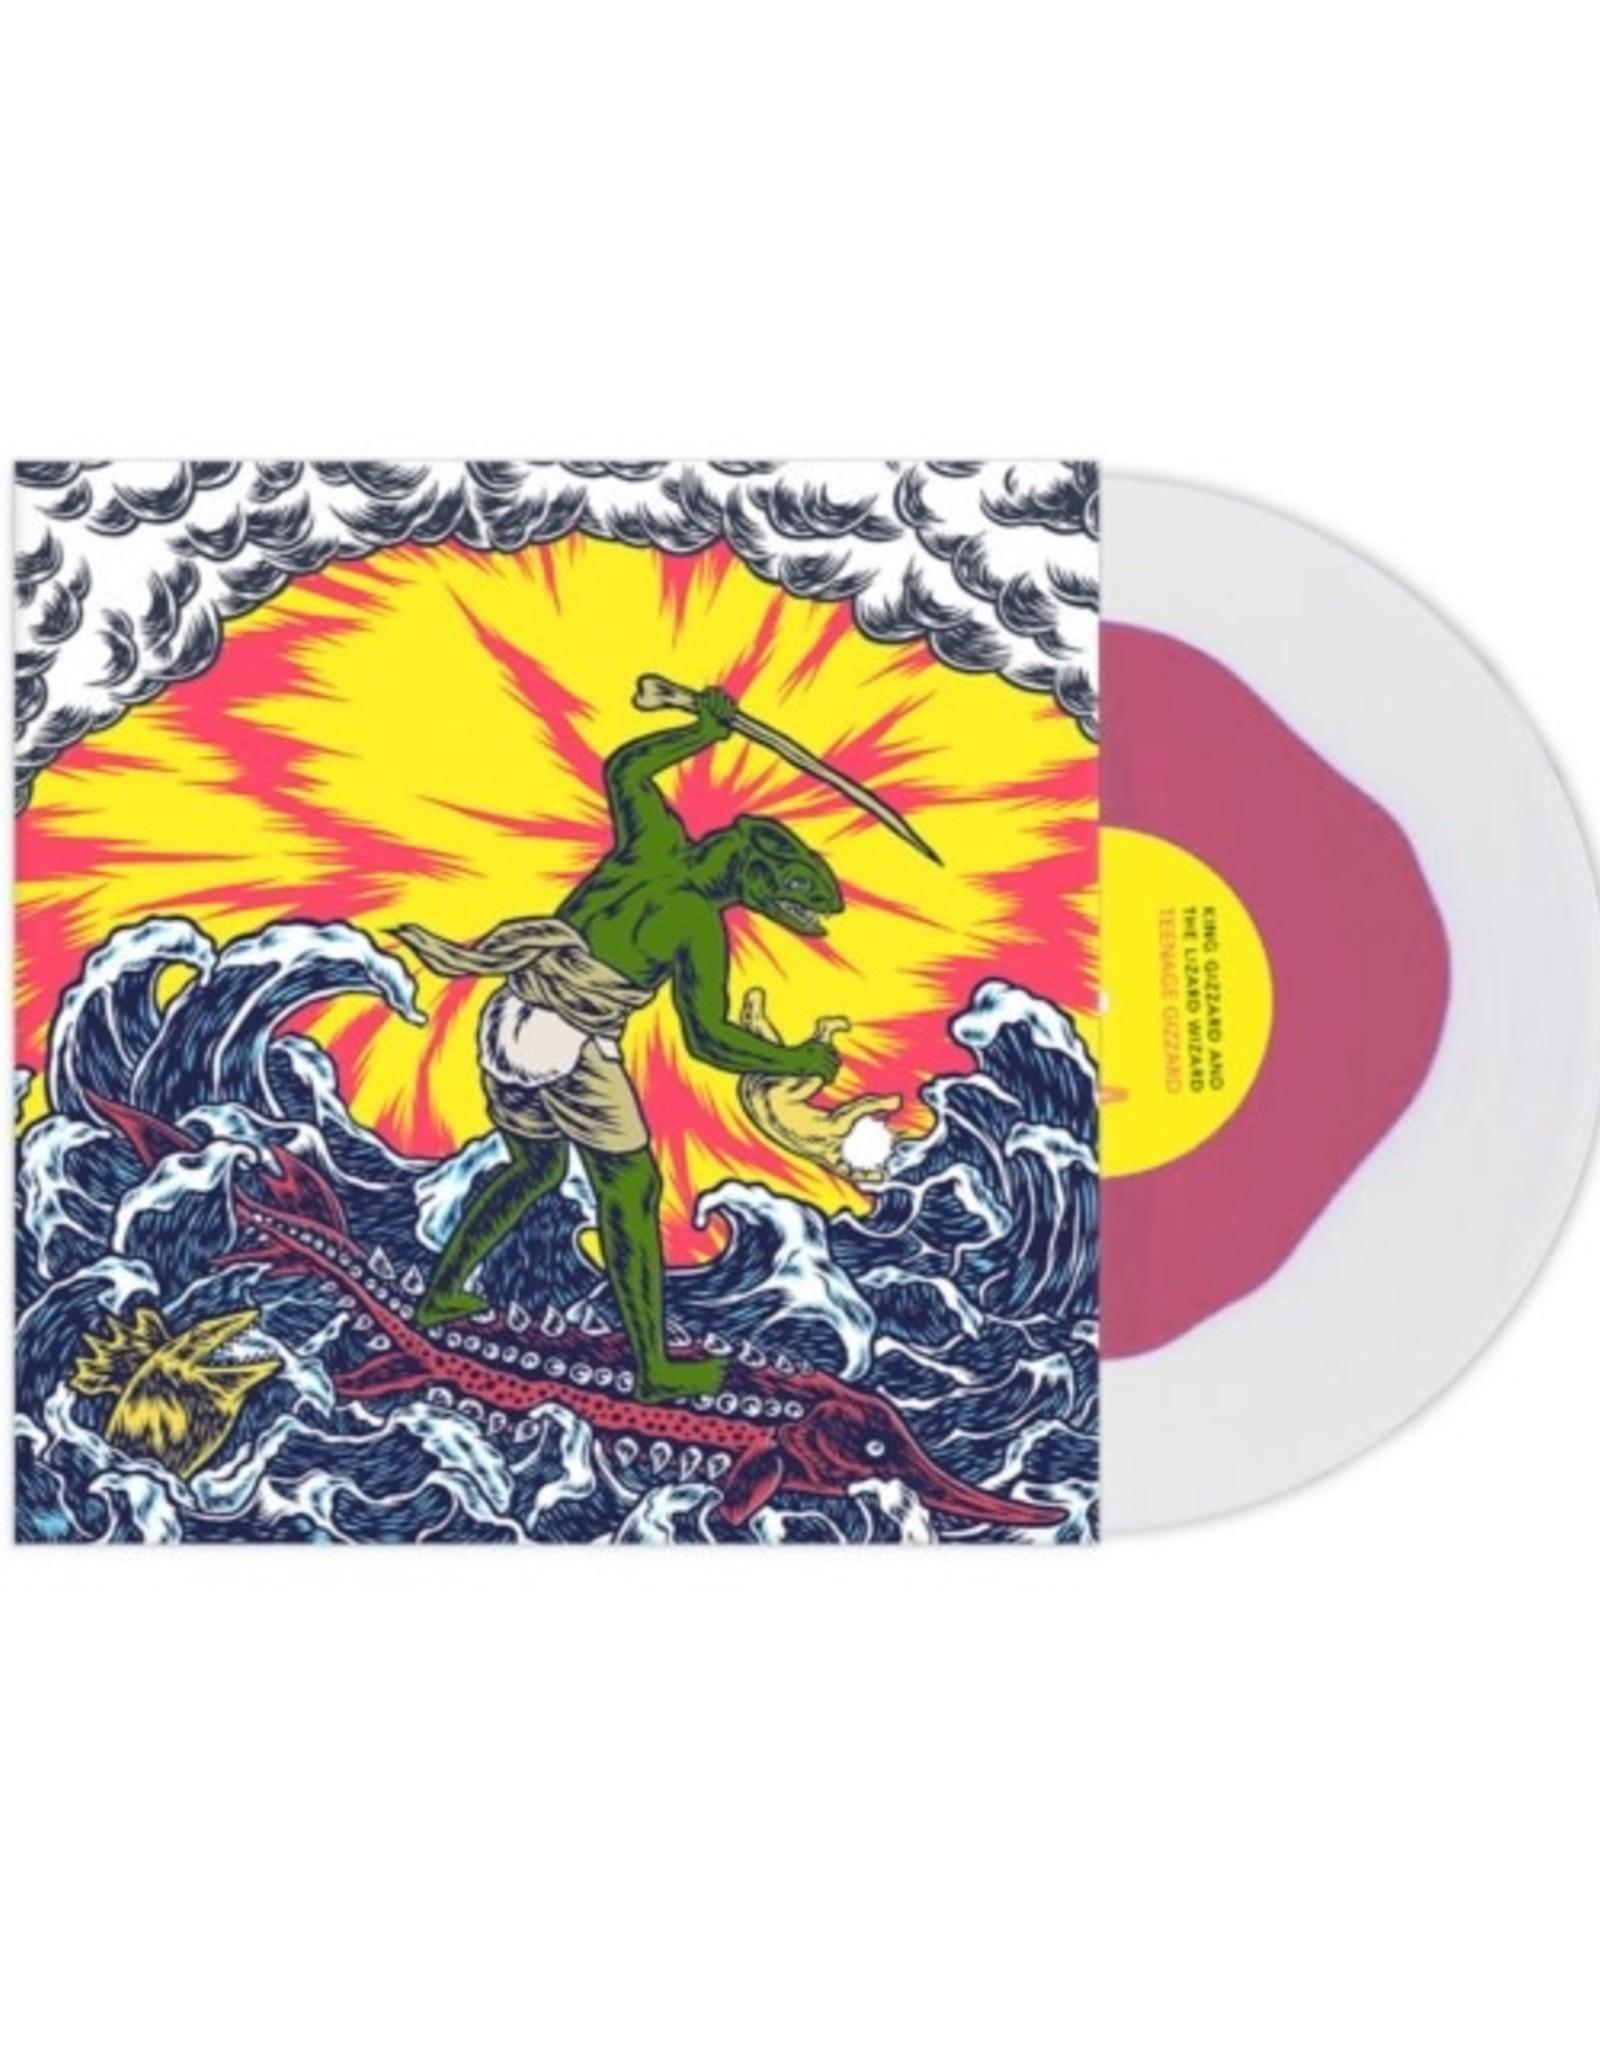 King Gizzard & the Lizard Wizard - Teenage Lizard \+ Hidden Live 7Inch (Pink & Clear Vinyl)